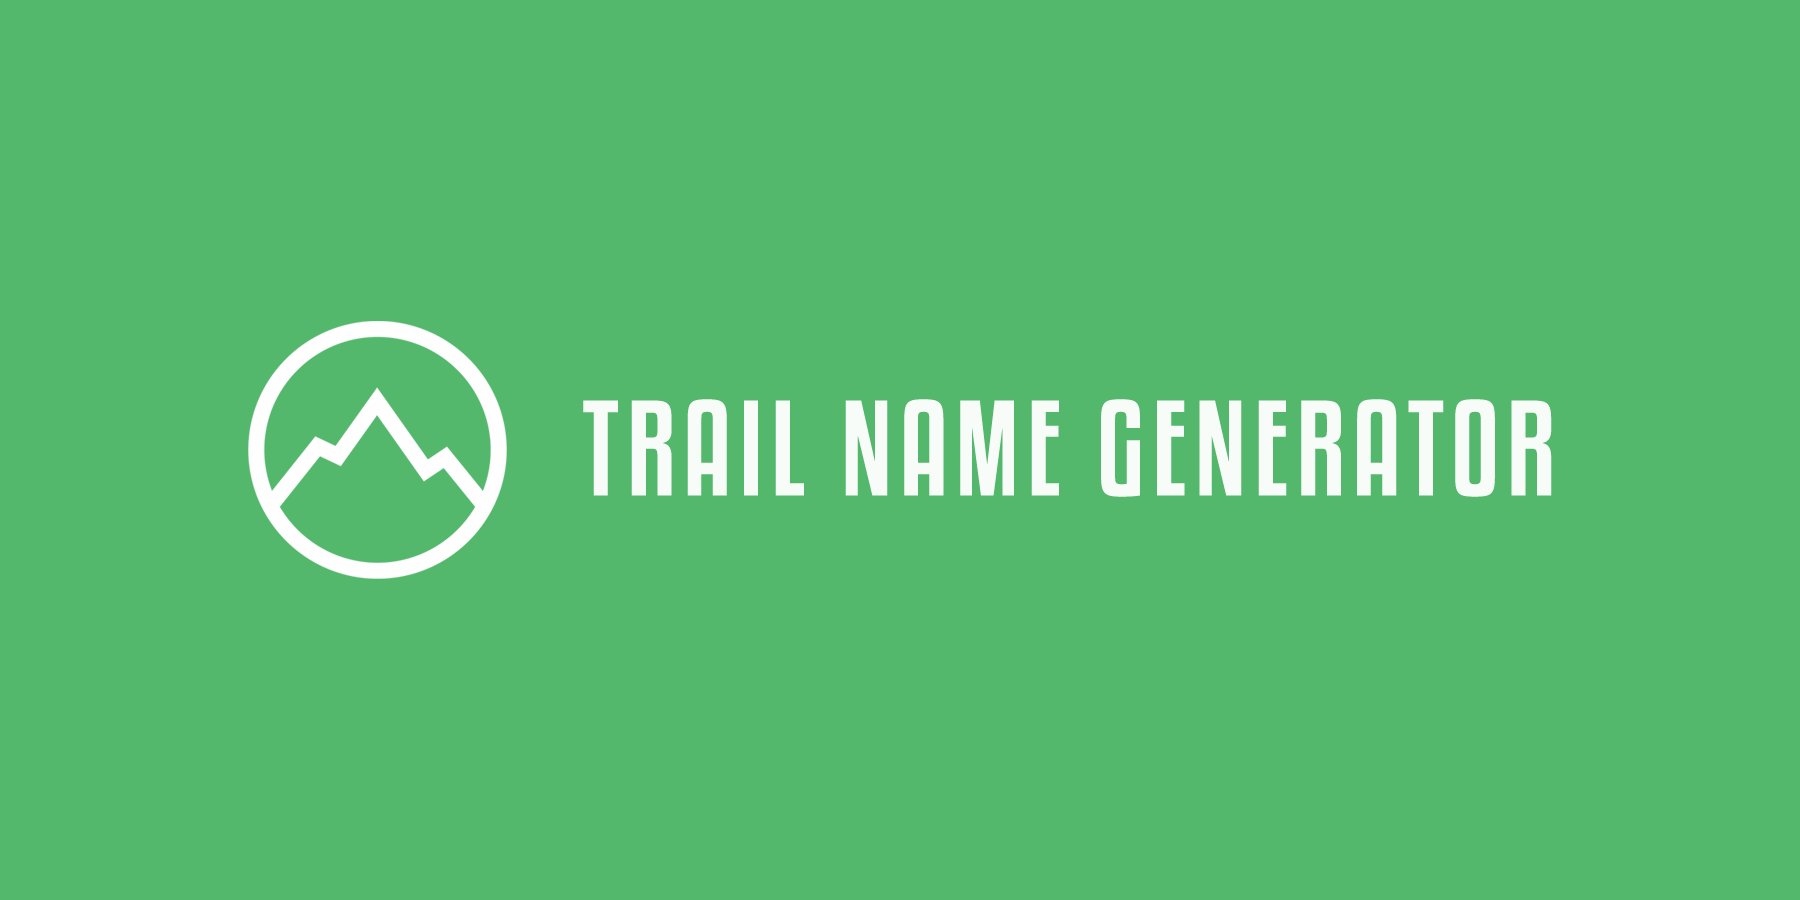 Trail Name Generator The Trek